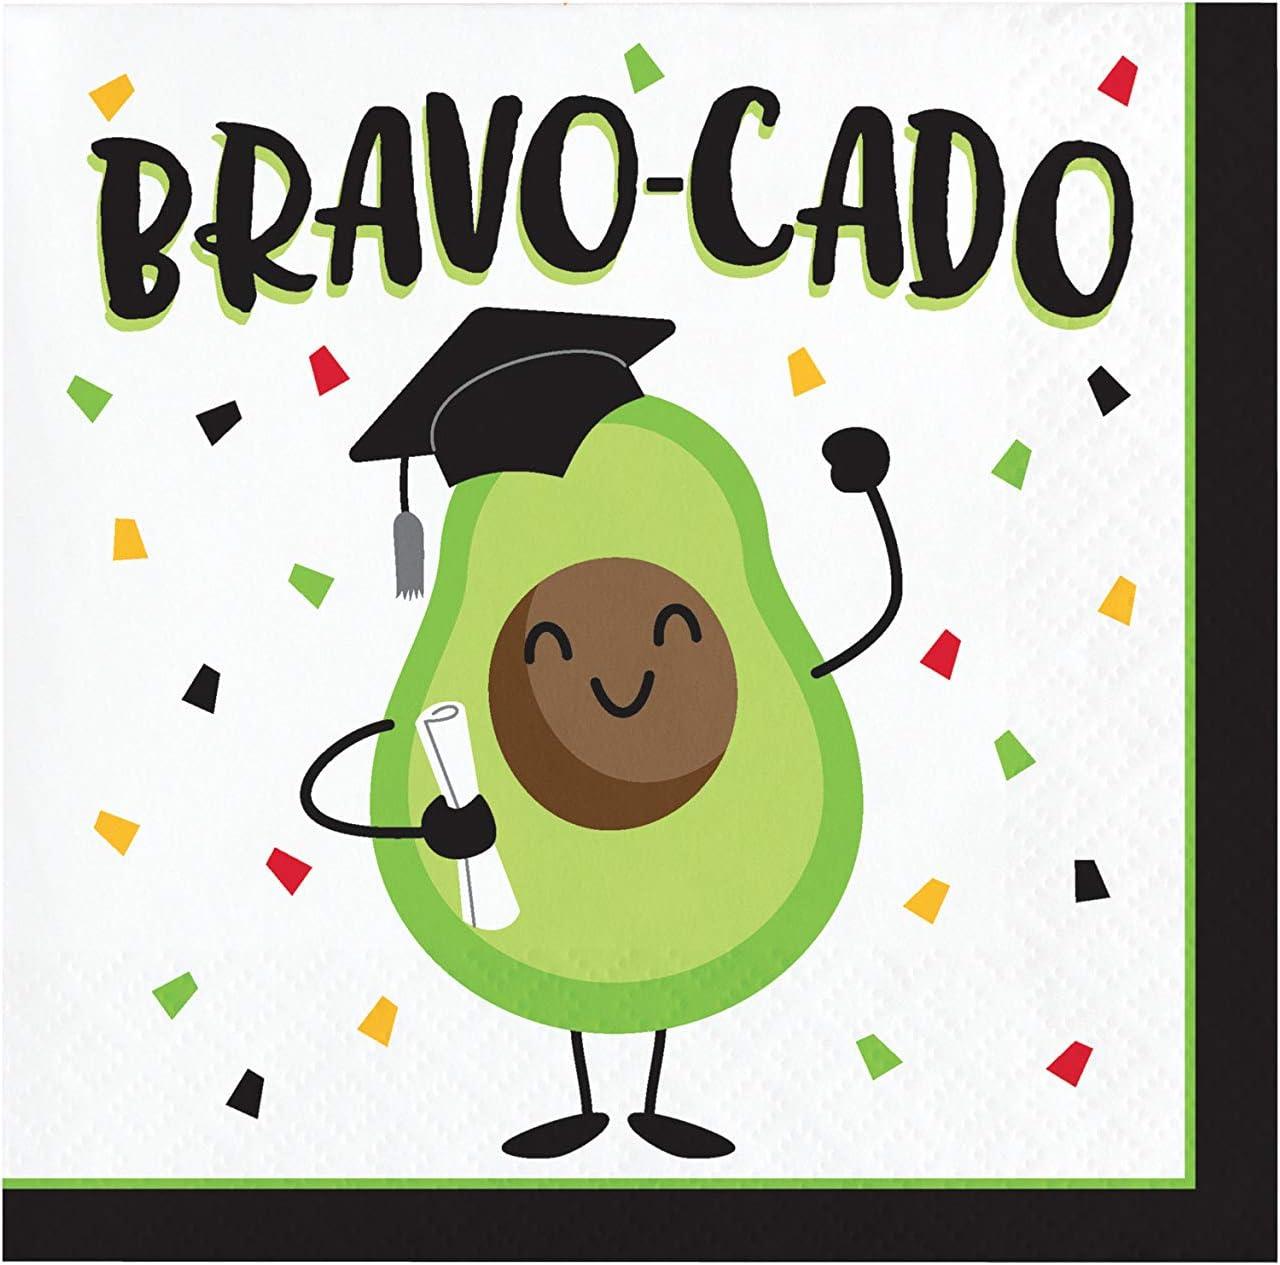 Creative Converting Bravo-cado Graduation Beverage Napkins, 5